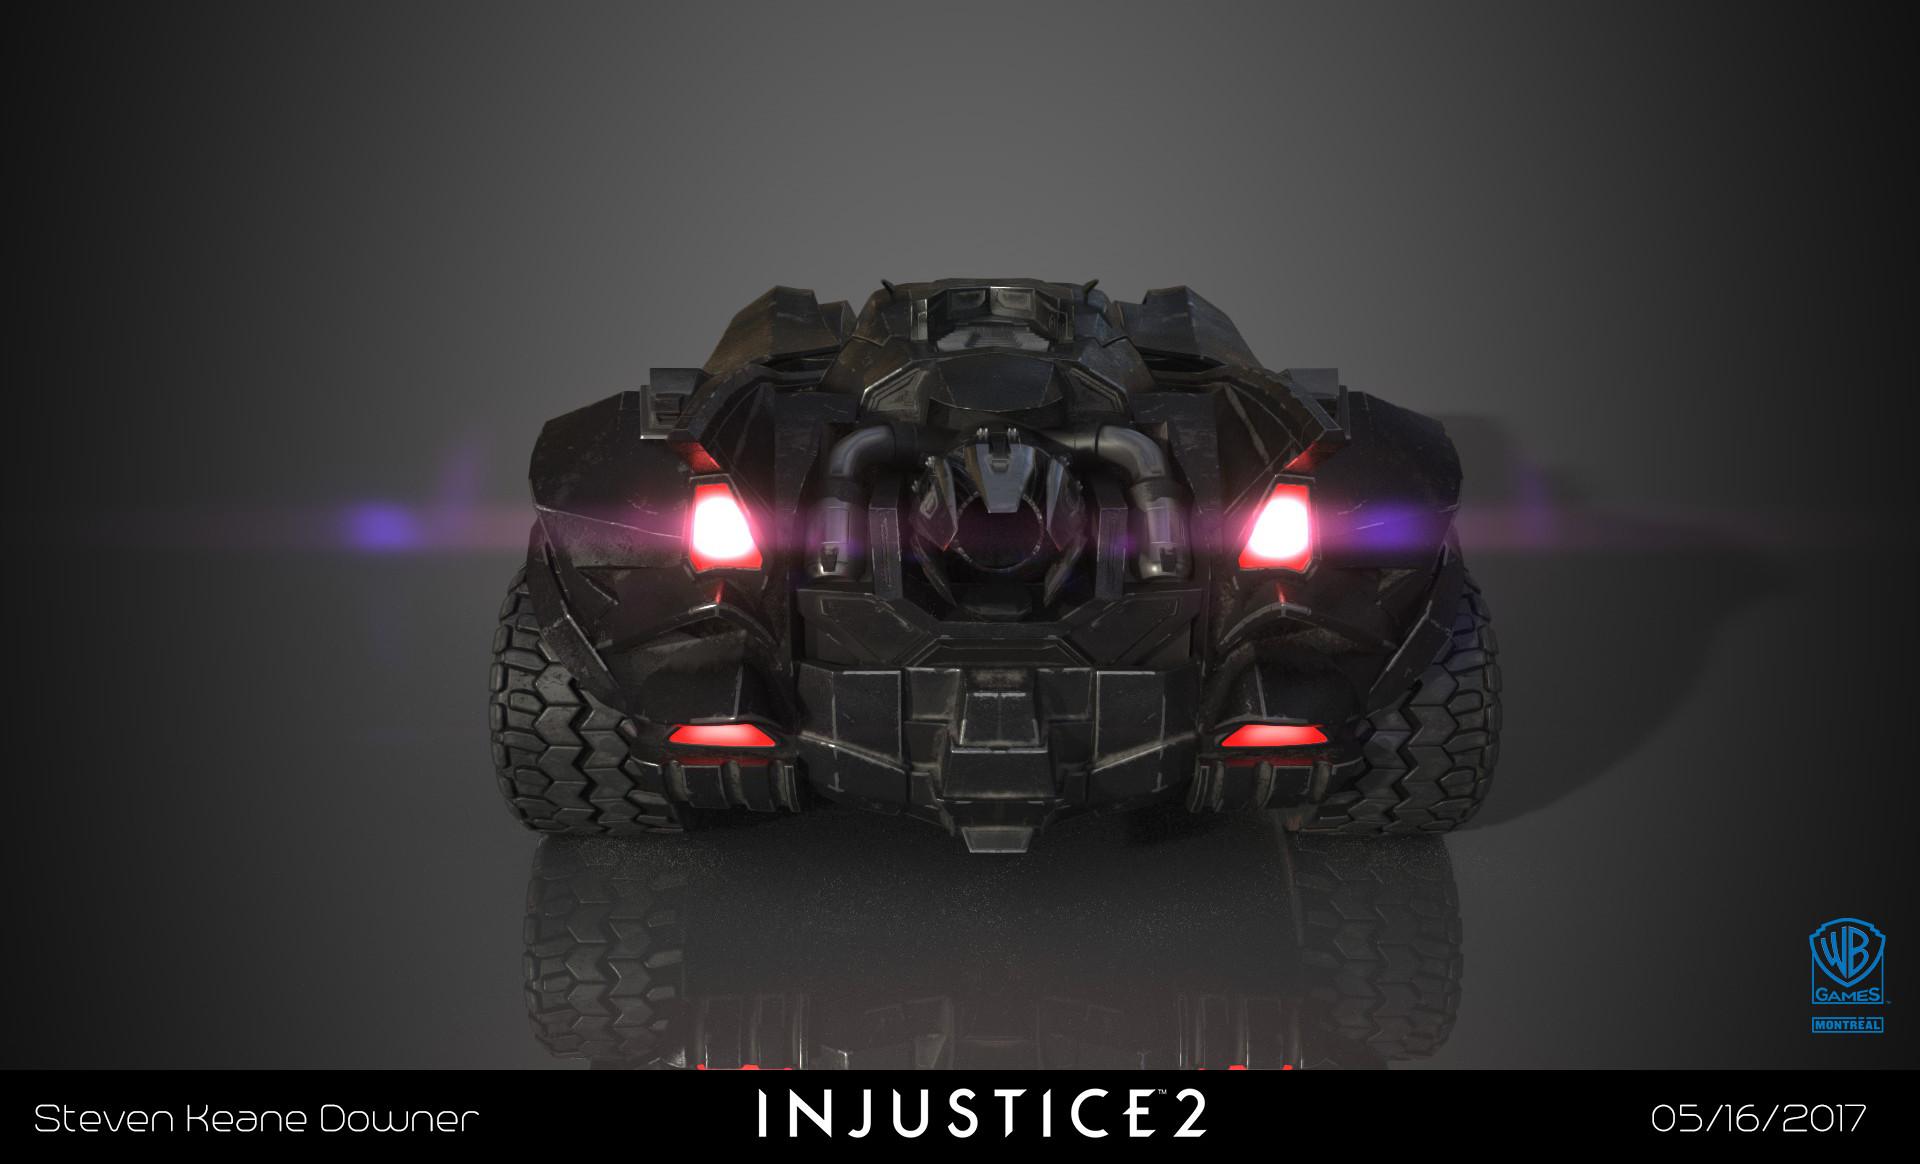 Steven Downer Injustice 2 Batmobile Cinematics